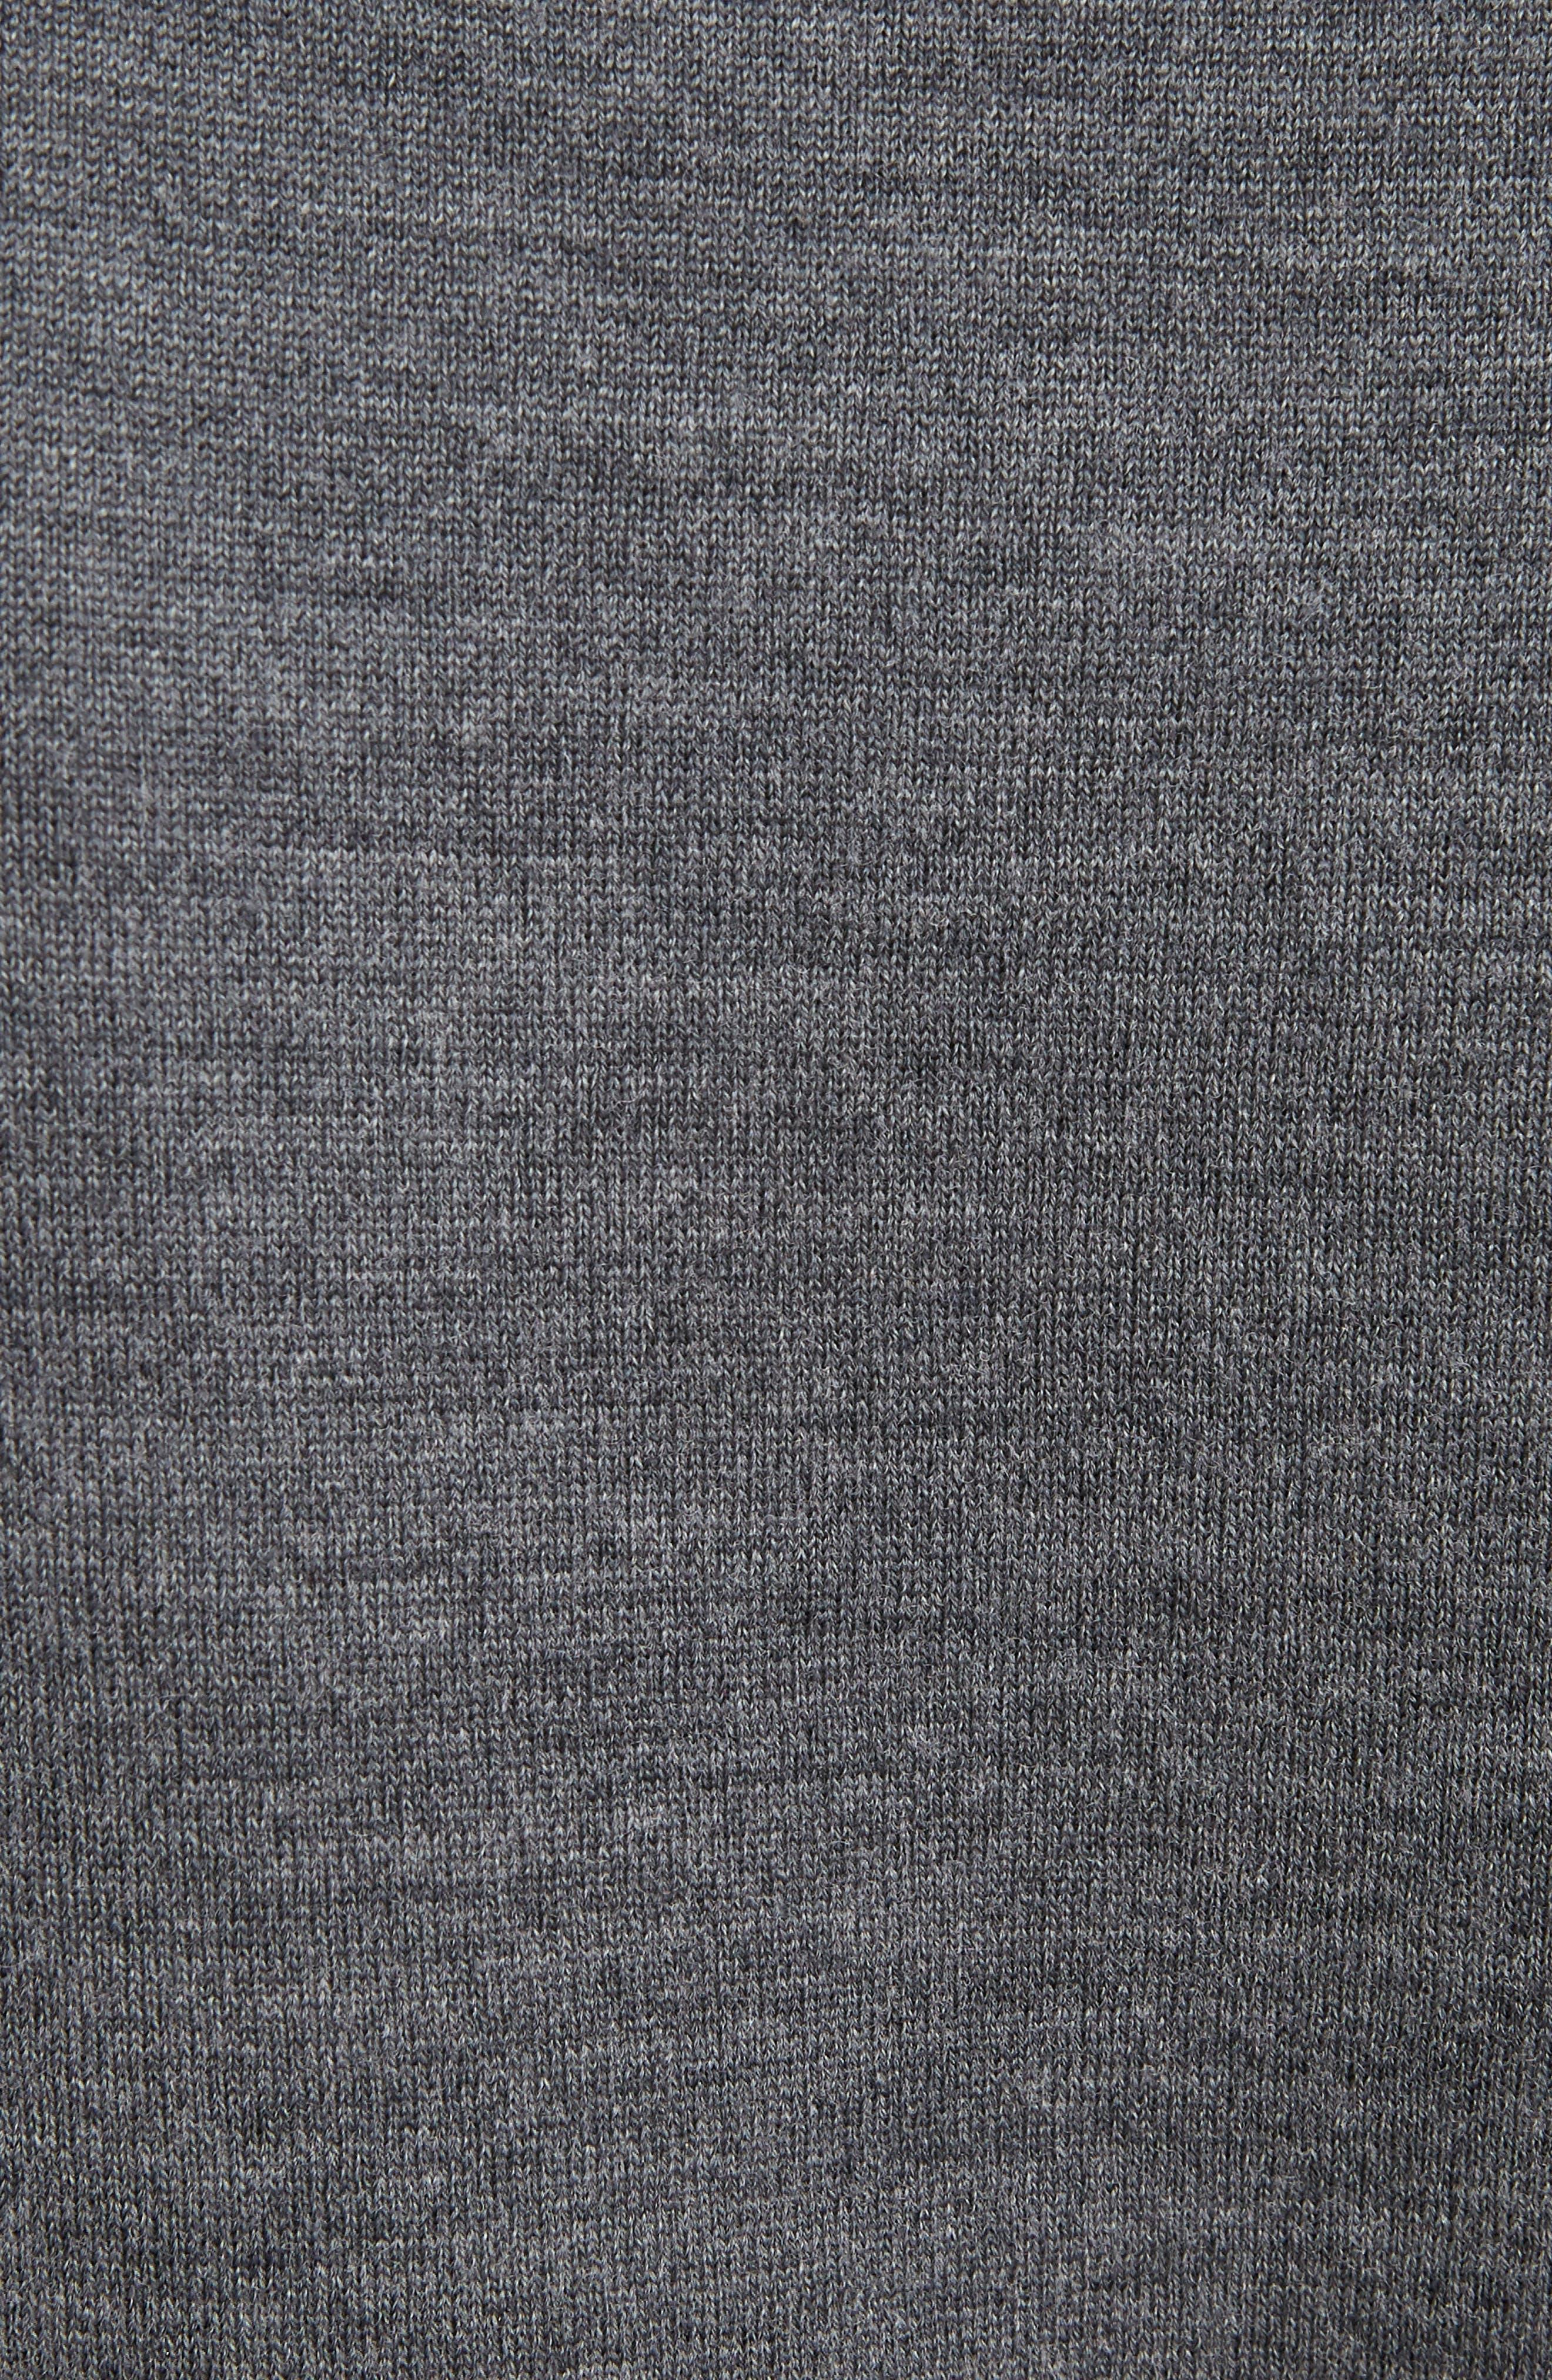 Brocade C Sweater,                             Alternate thumbnail 5, color,                             CONFIDENT GREY